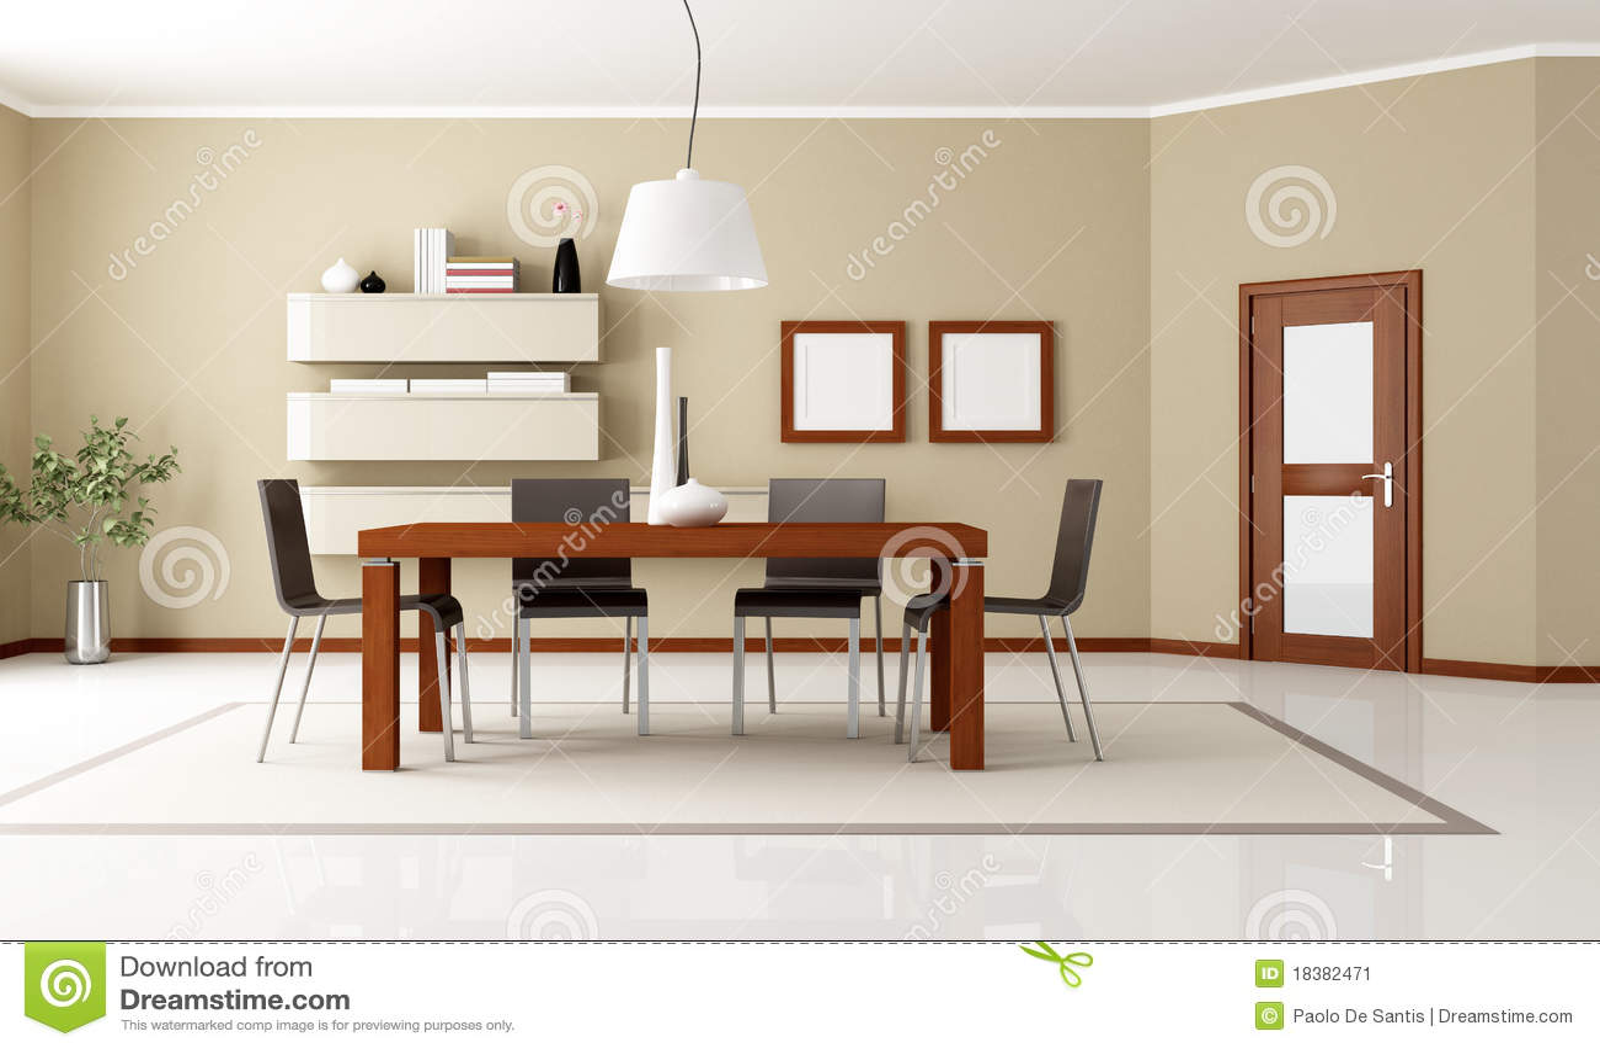 Sala Da Pranzo Moderna Elegante Immagine Stock Immagine: 18382471 #85A724 1300 869 Sala Da Pranzo Arte Contemporanea